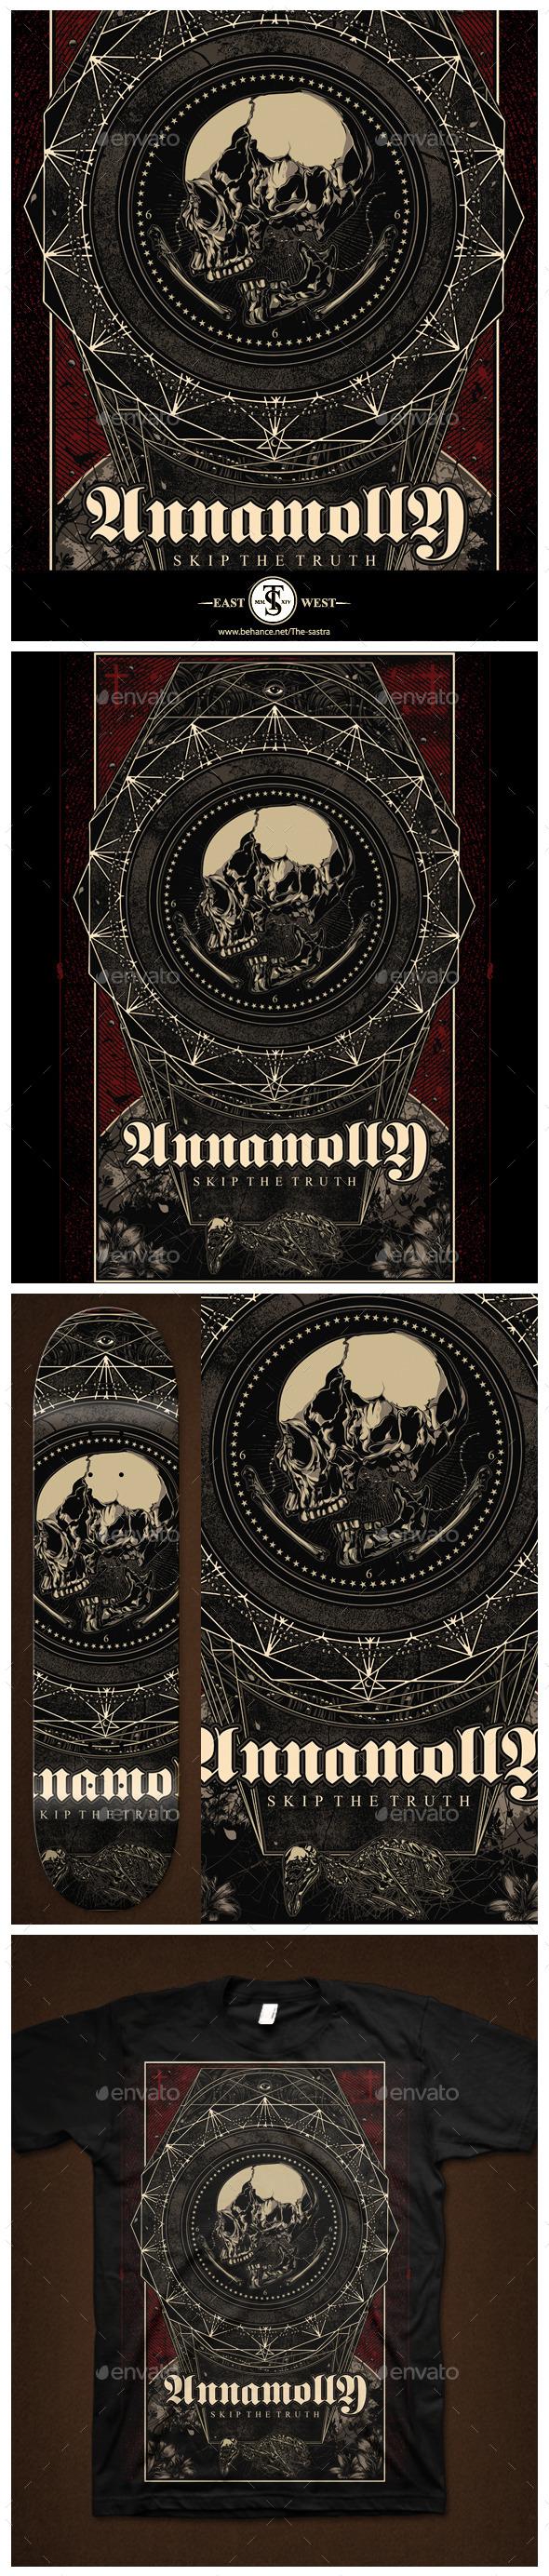 Annamolly - Grunge Designs